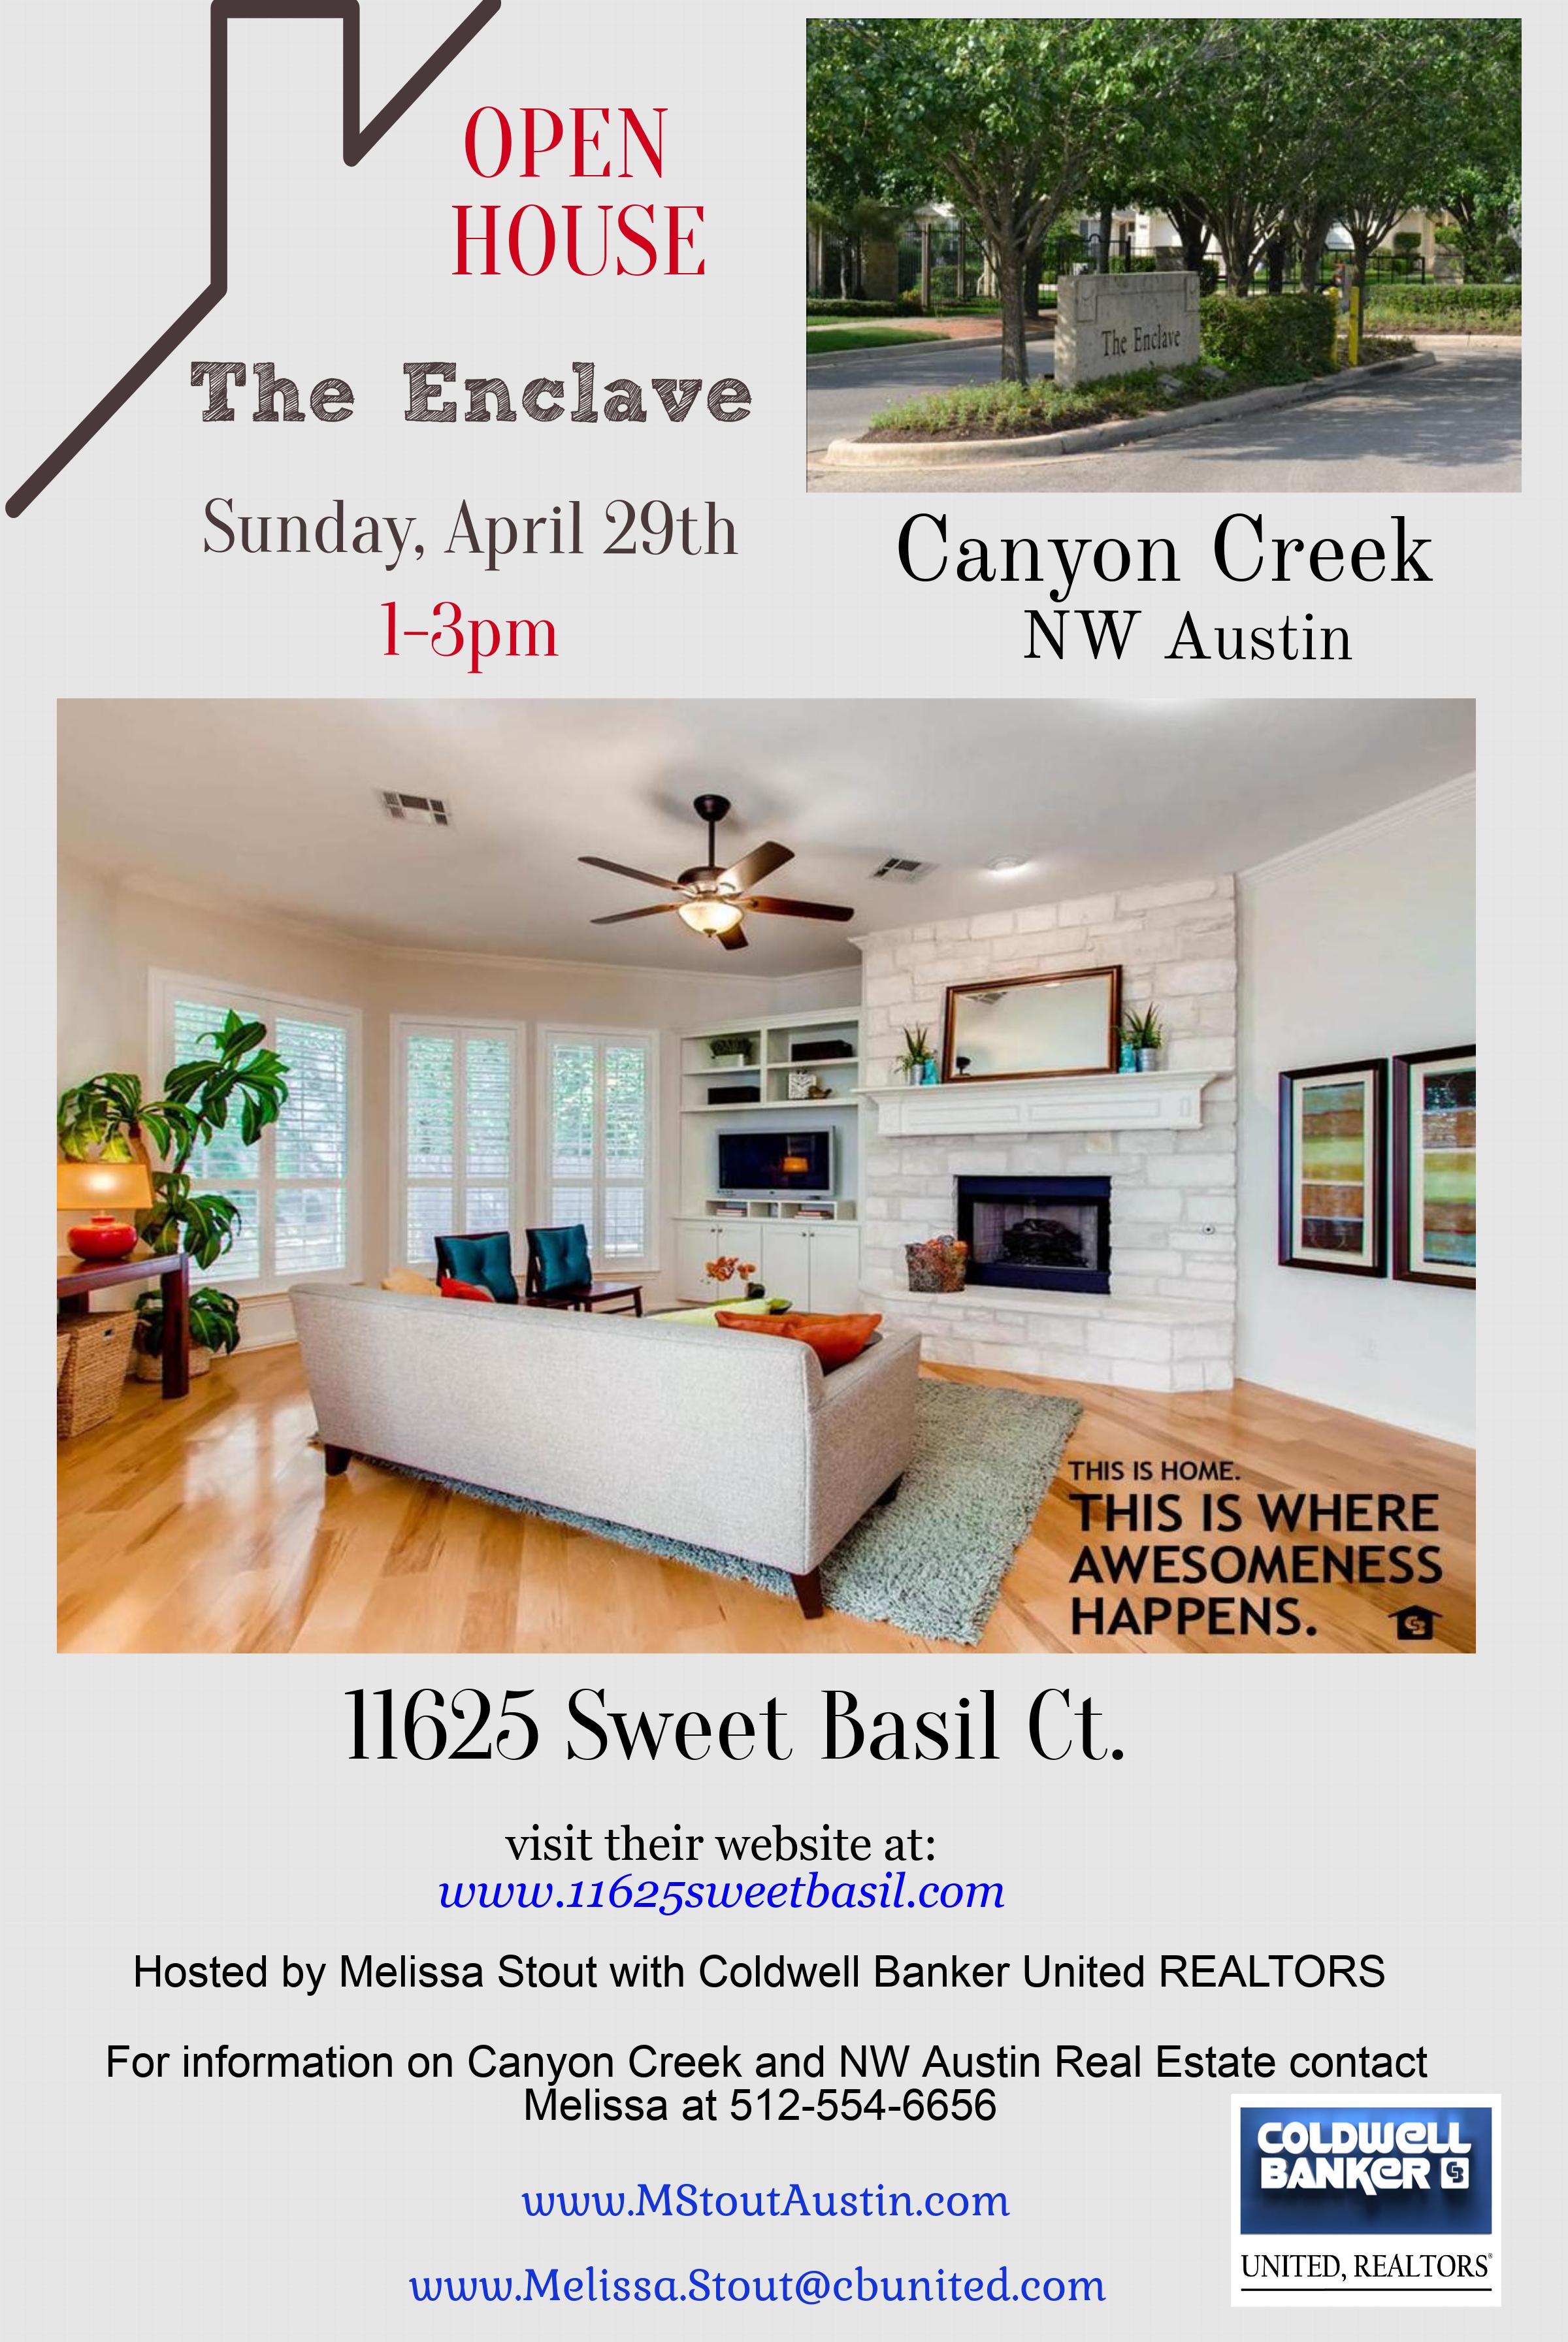 OPEN HOUSE: NW Austin Canyon Creek ~Sunday, April 29th